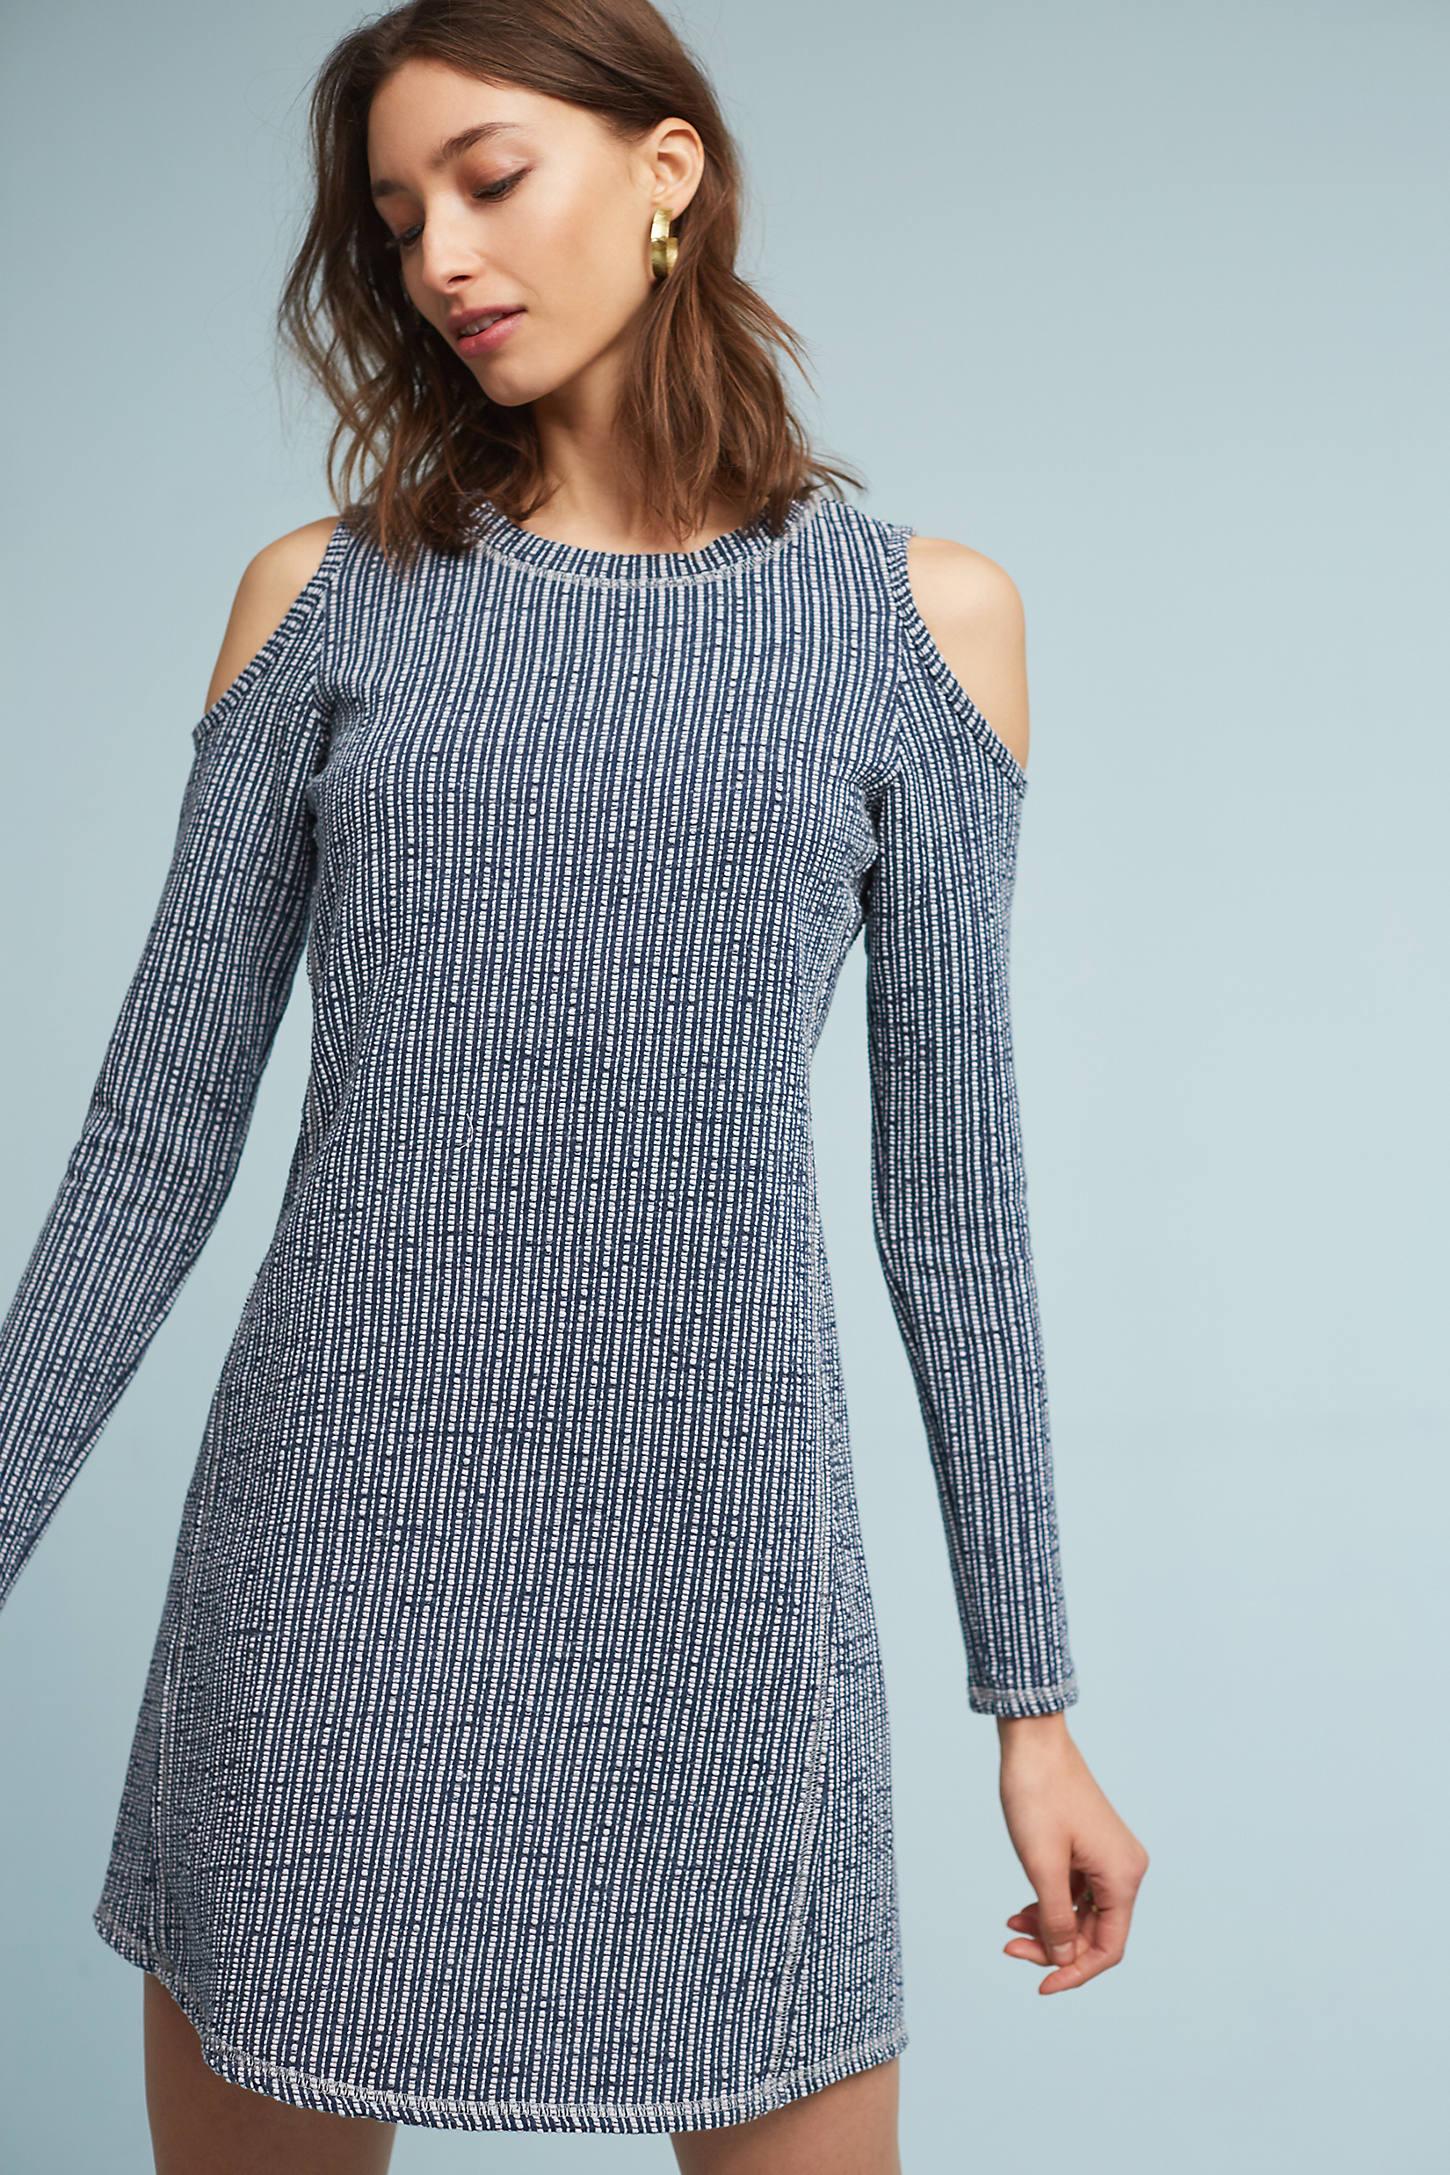 Textured Knit Open-Shoulder Dress